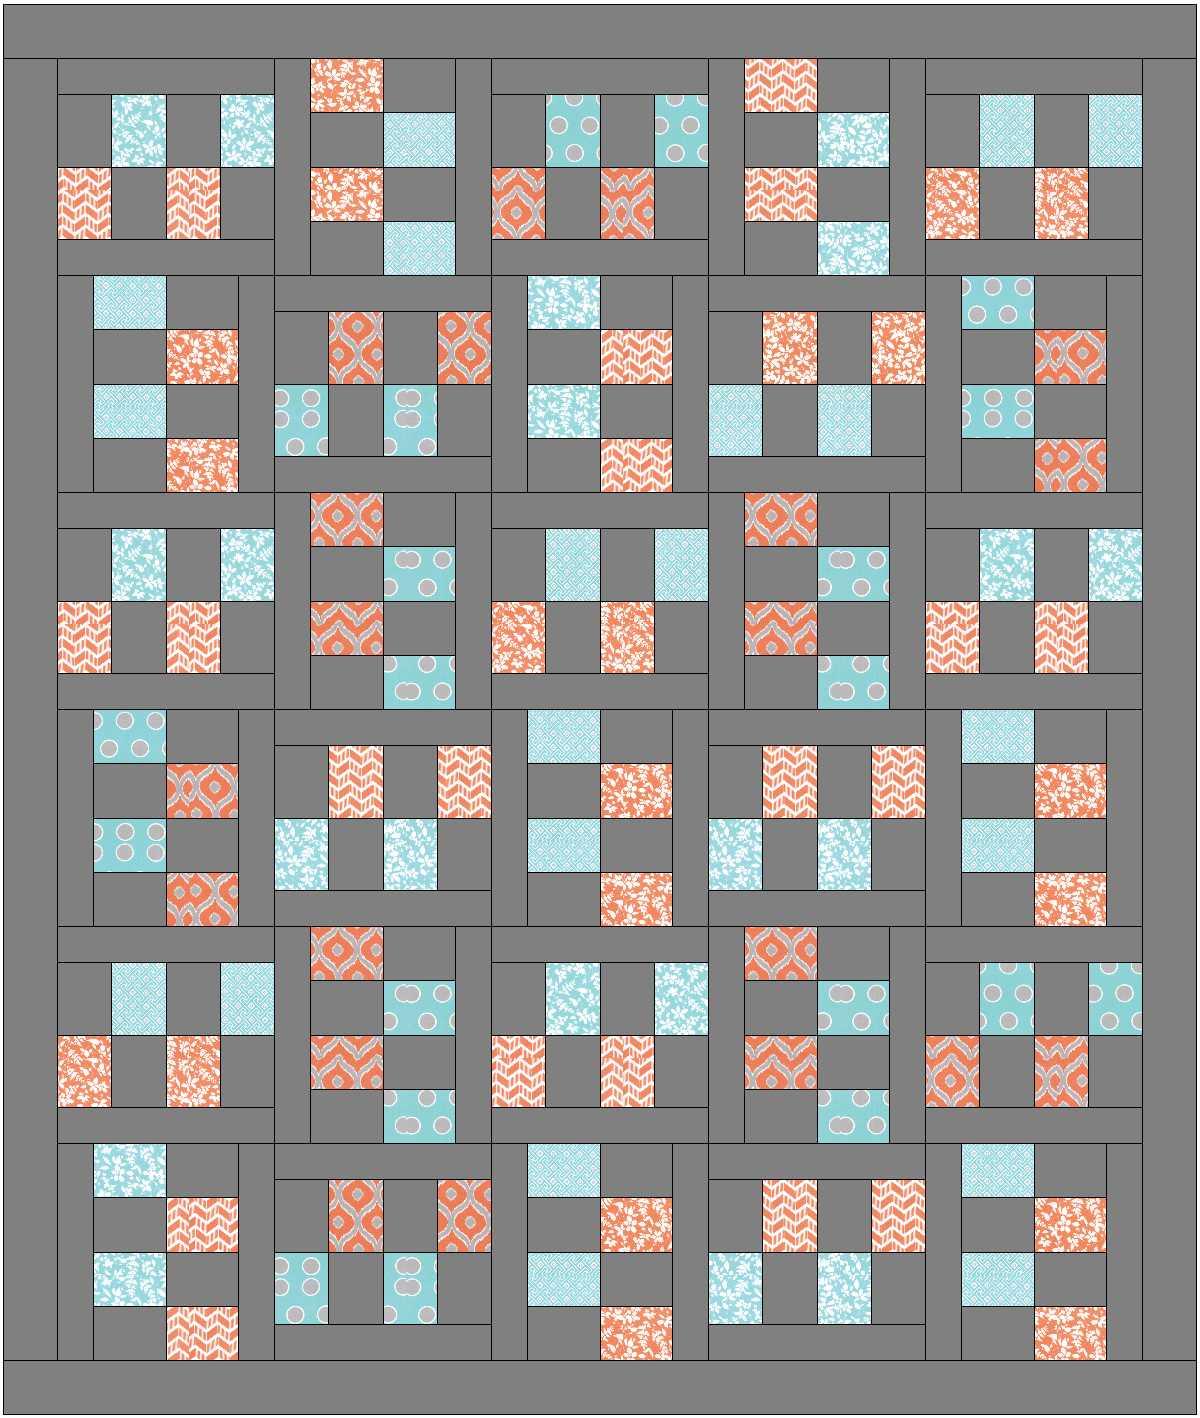 Alternating block option